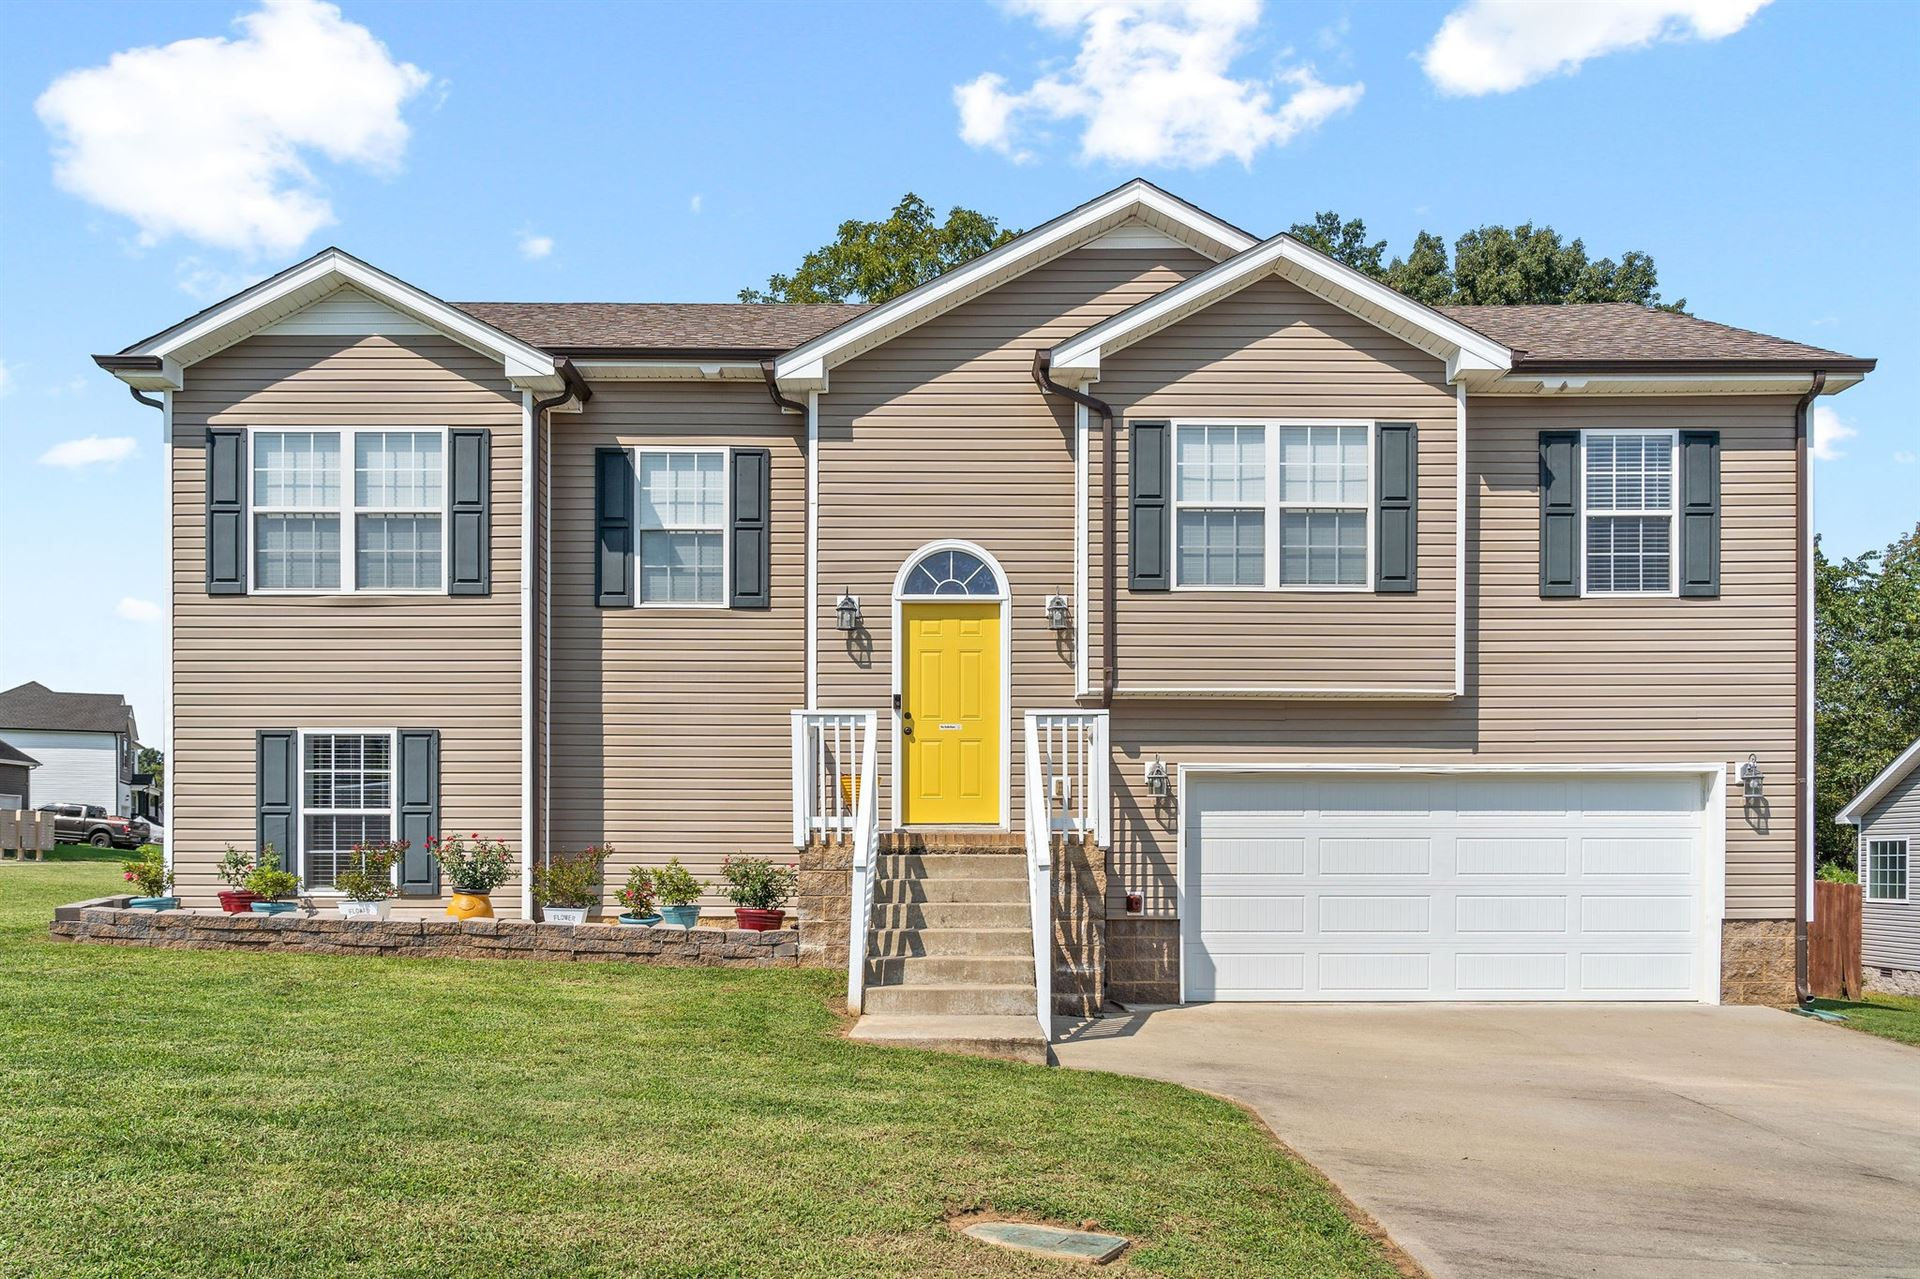 1264 Morstead Dr, Clarksville, TN 37042 - MLS#: 2293672